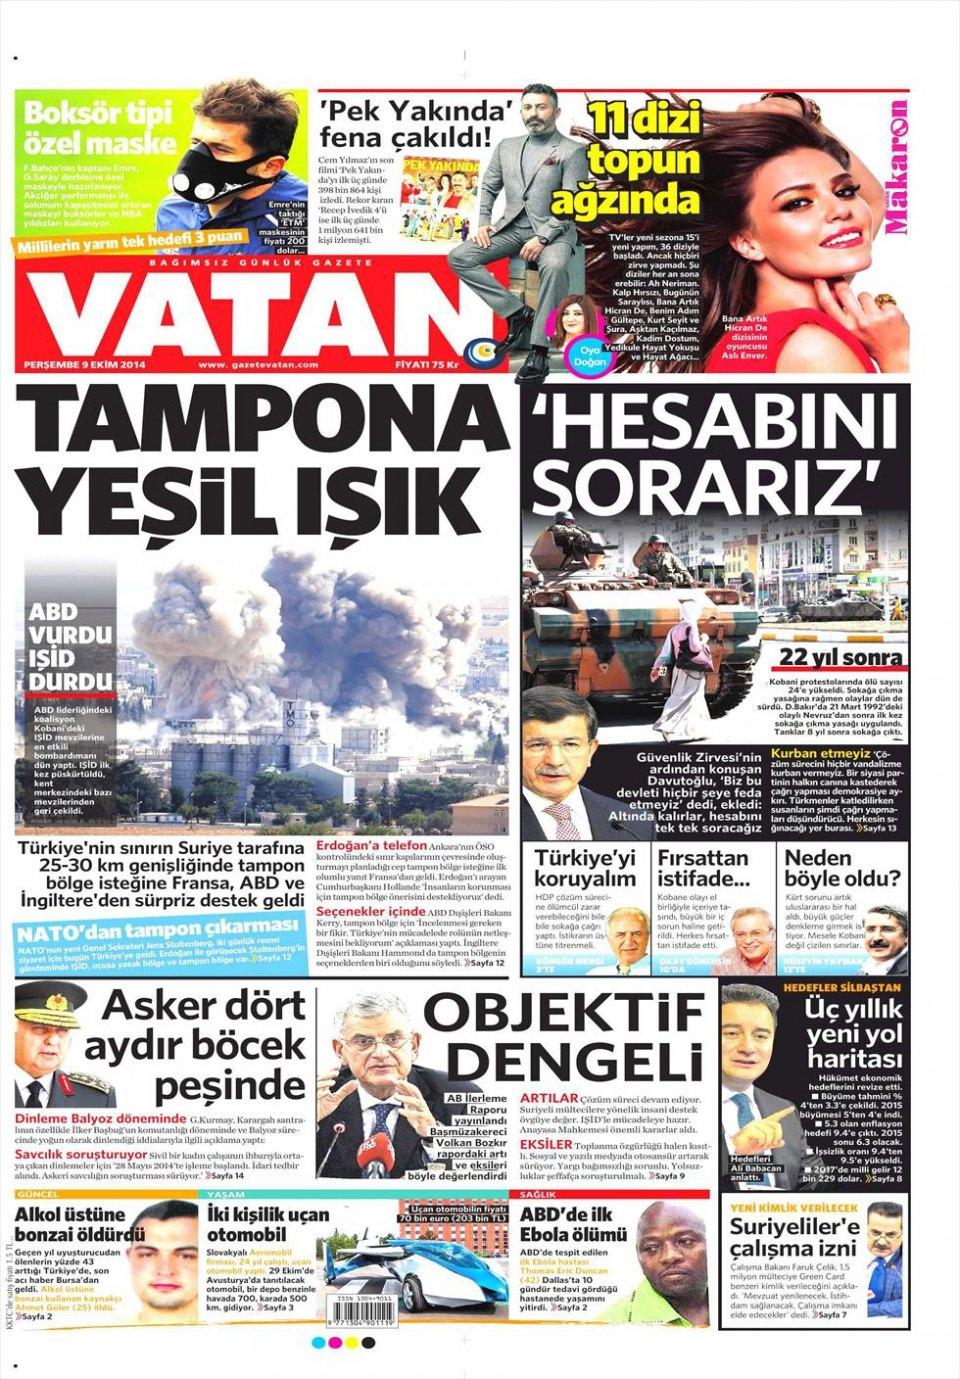 9 Ekim Gazete Manşetleri 21